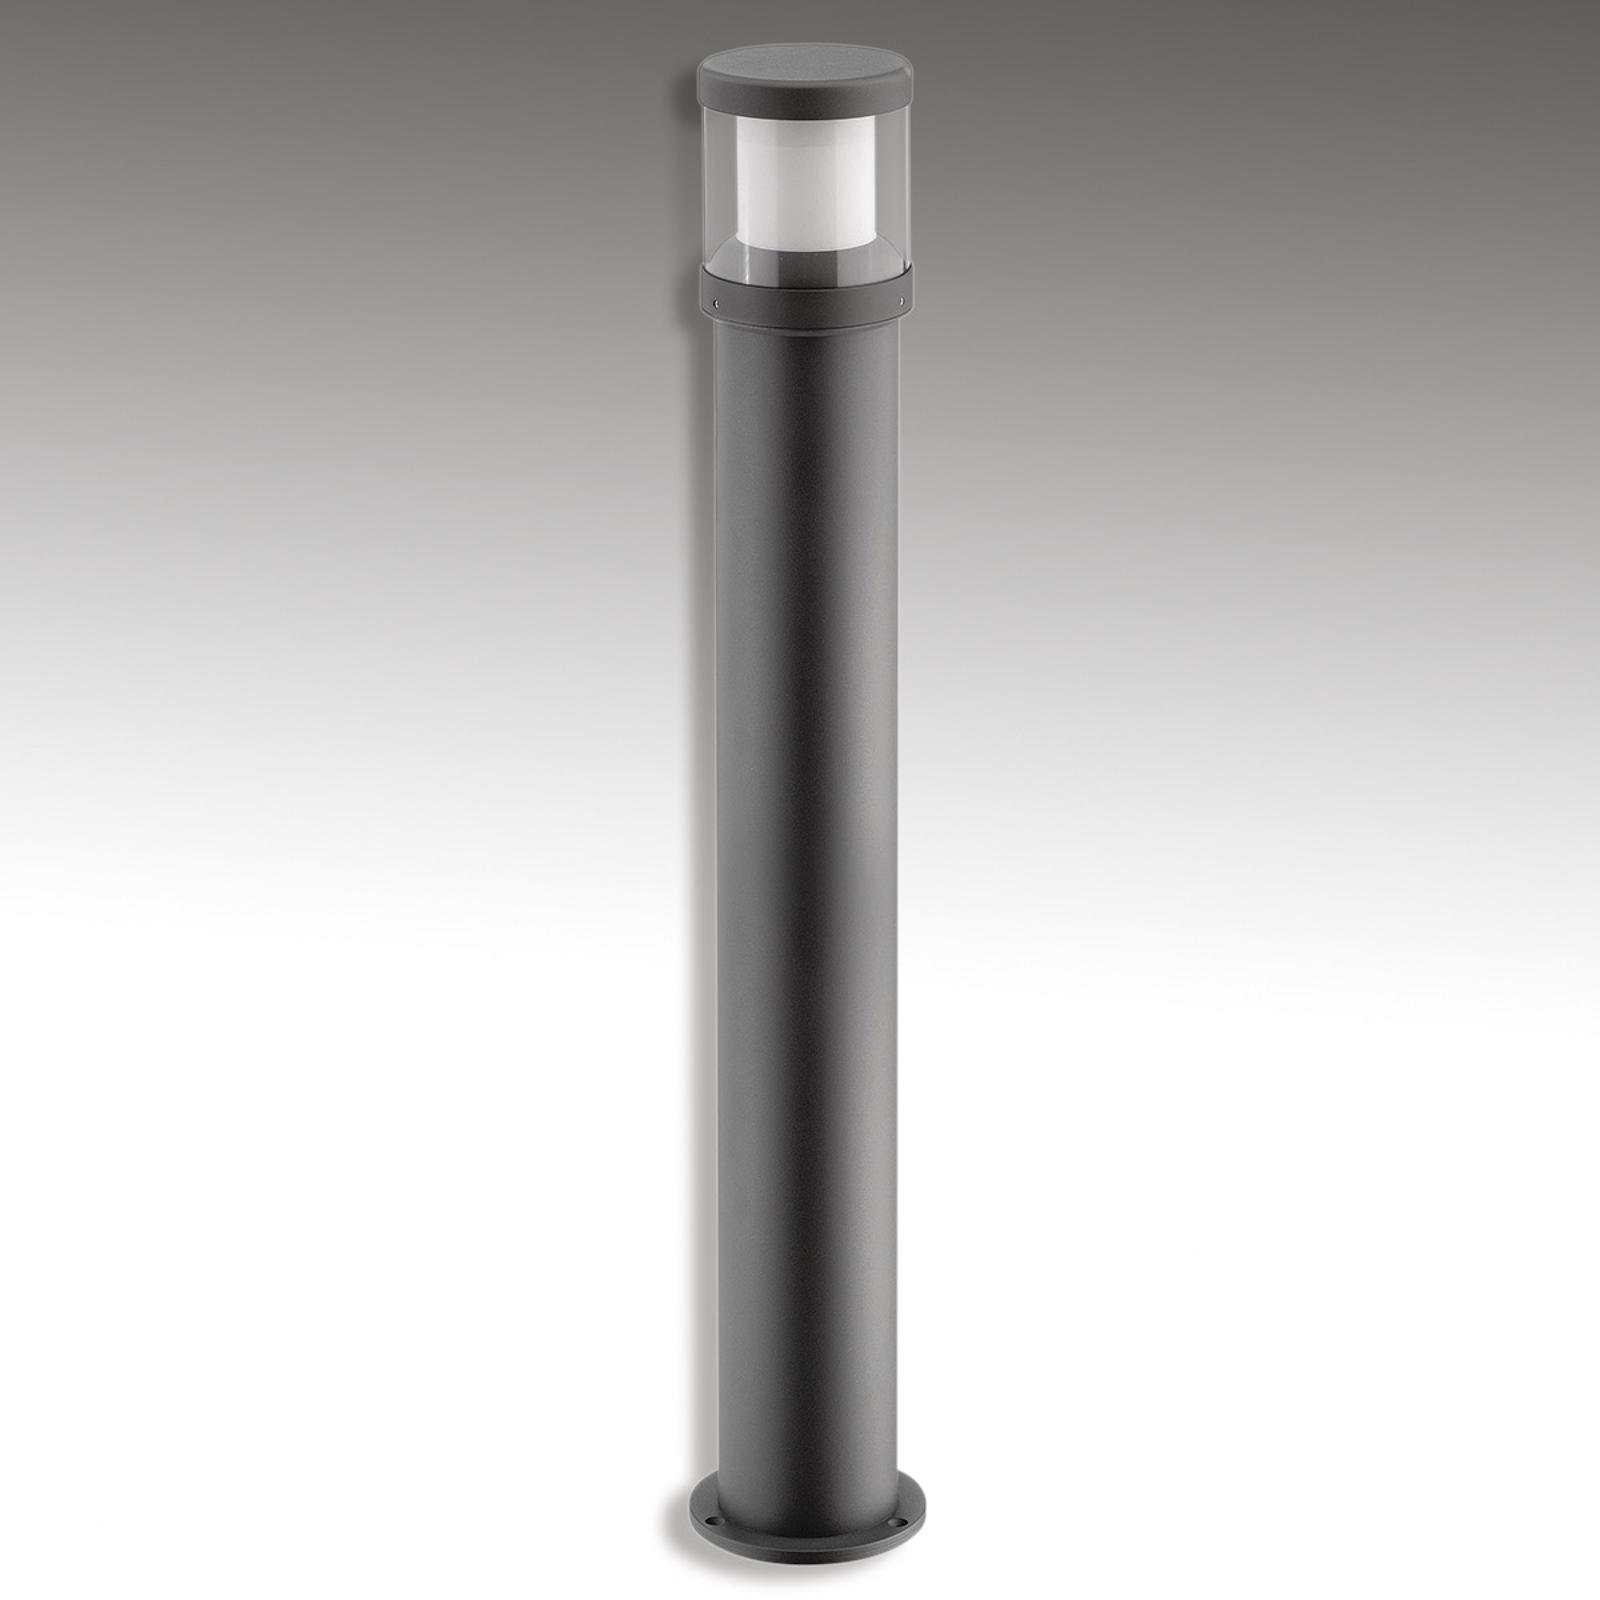 Borne lumineuse LED Levent - IP65